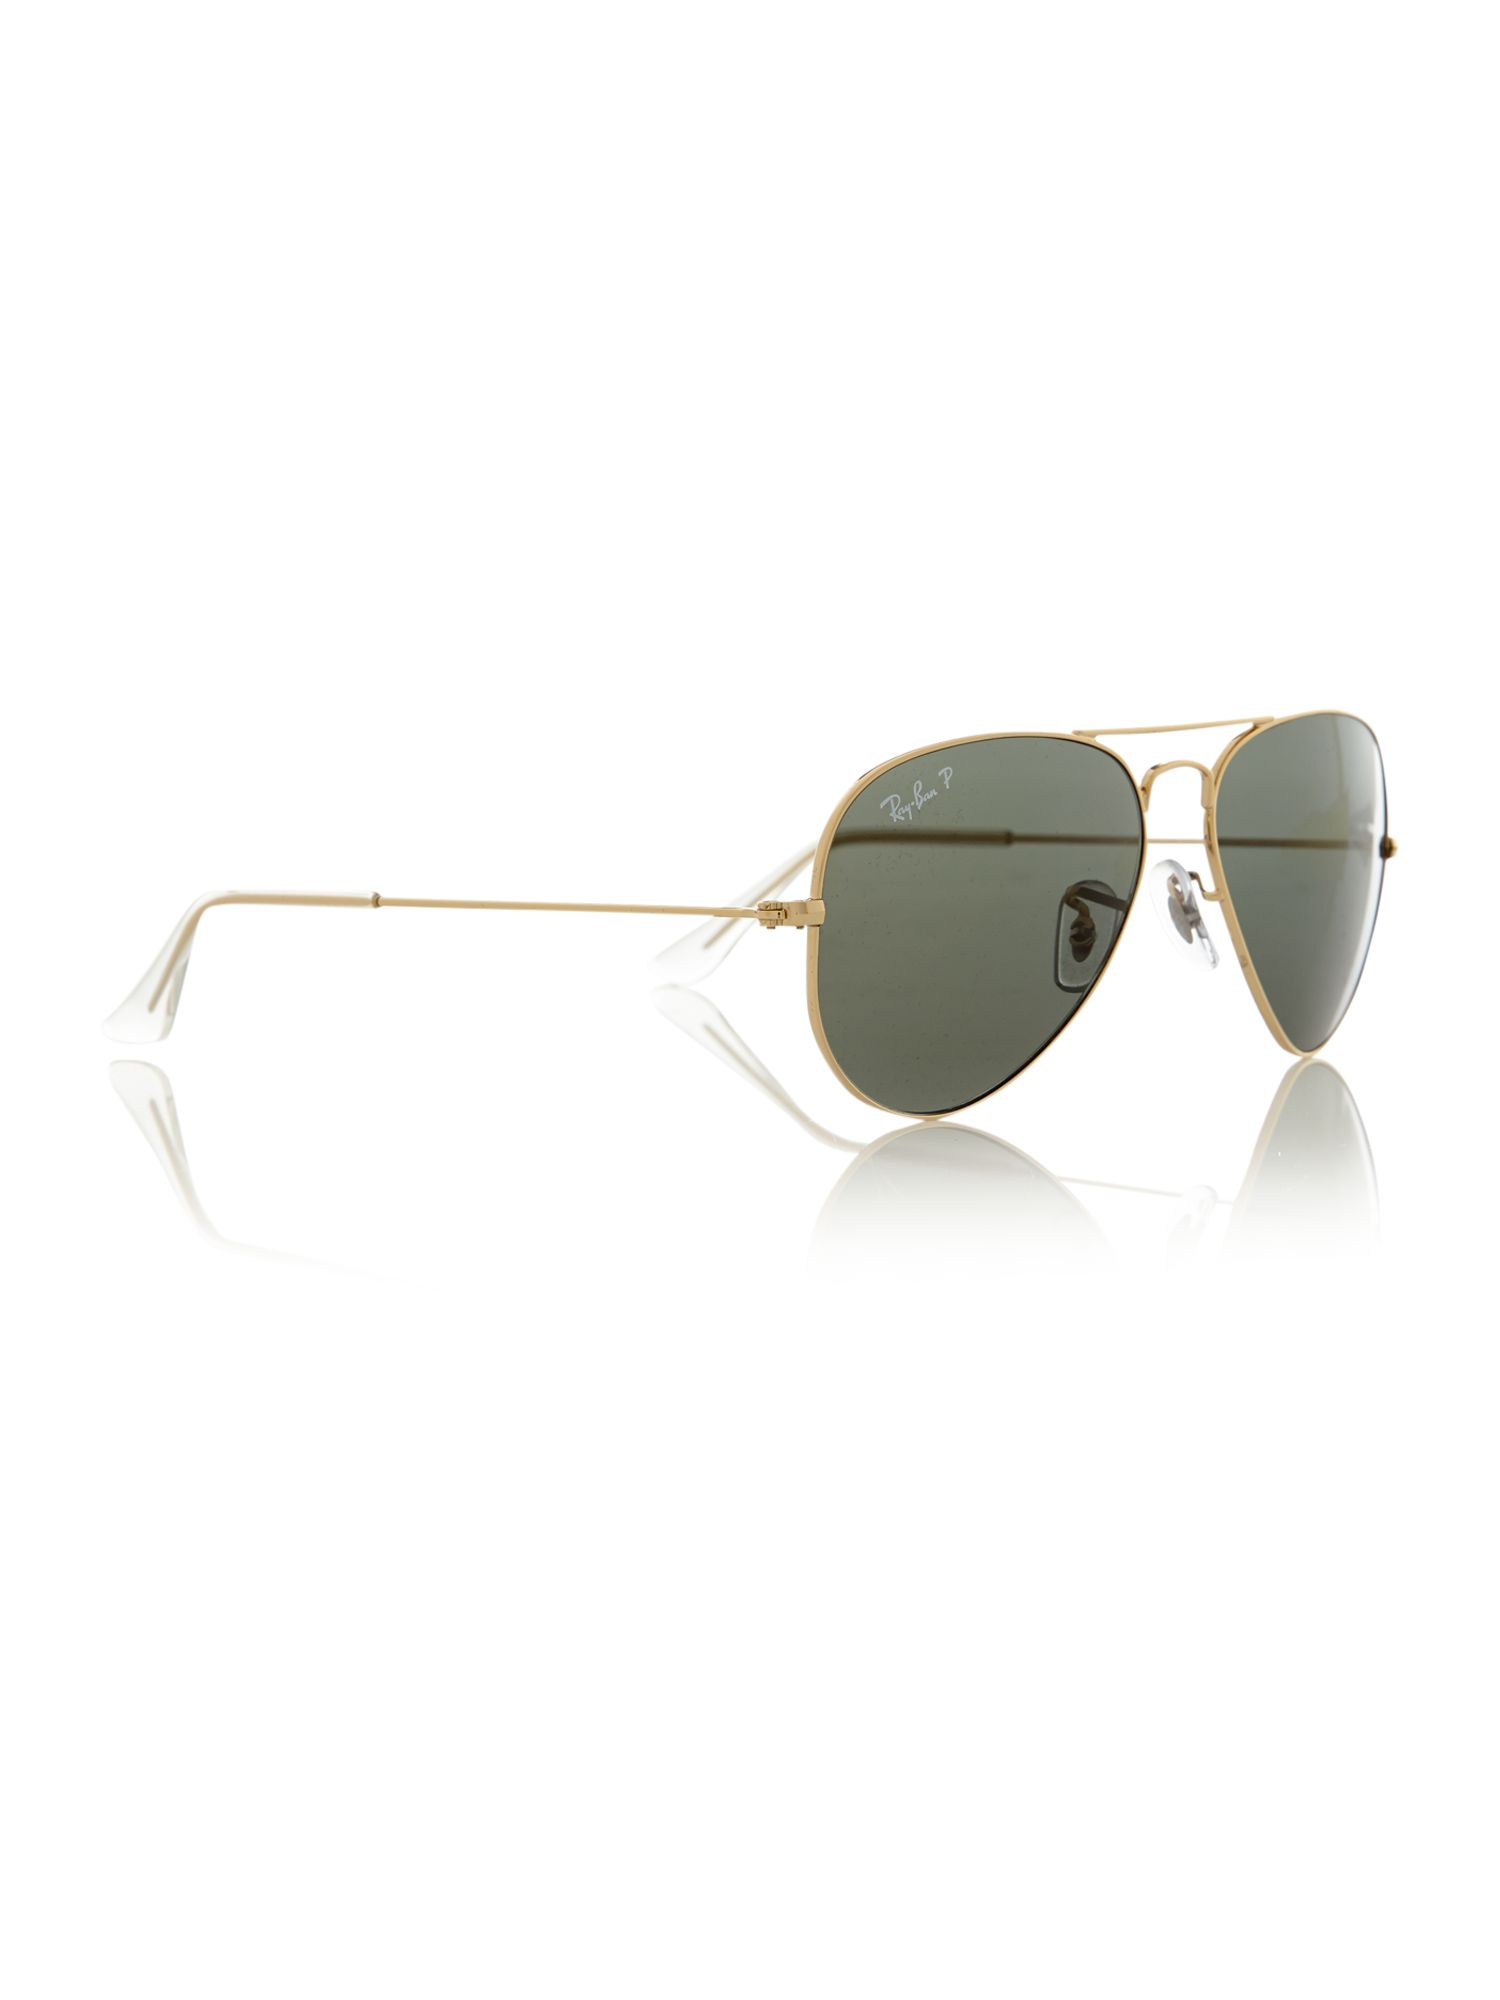 Ray-ban Men`s Arista Large Polarised Aviator Sunglasses in ...